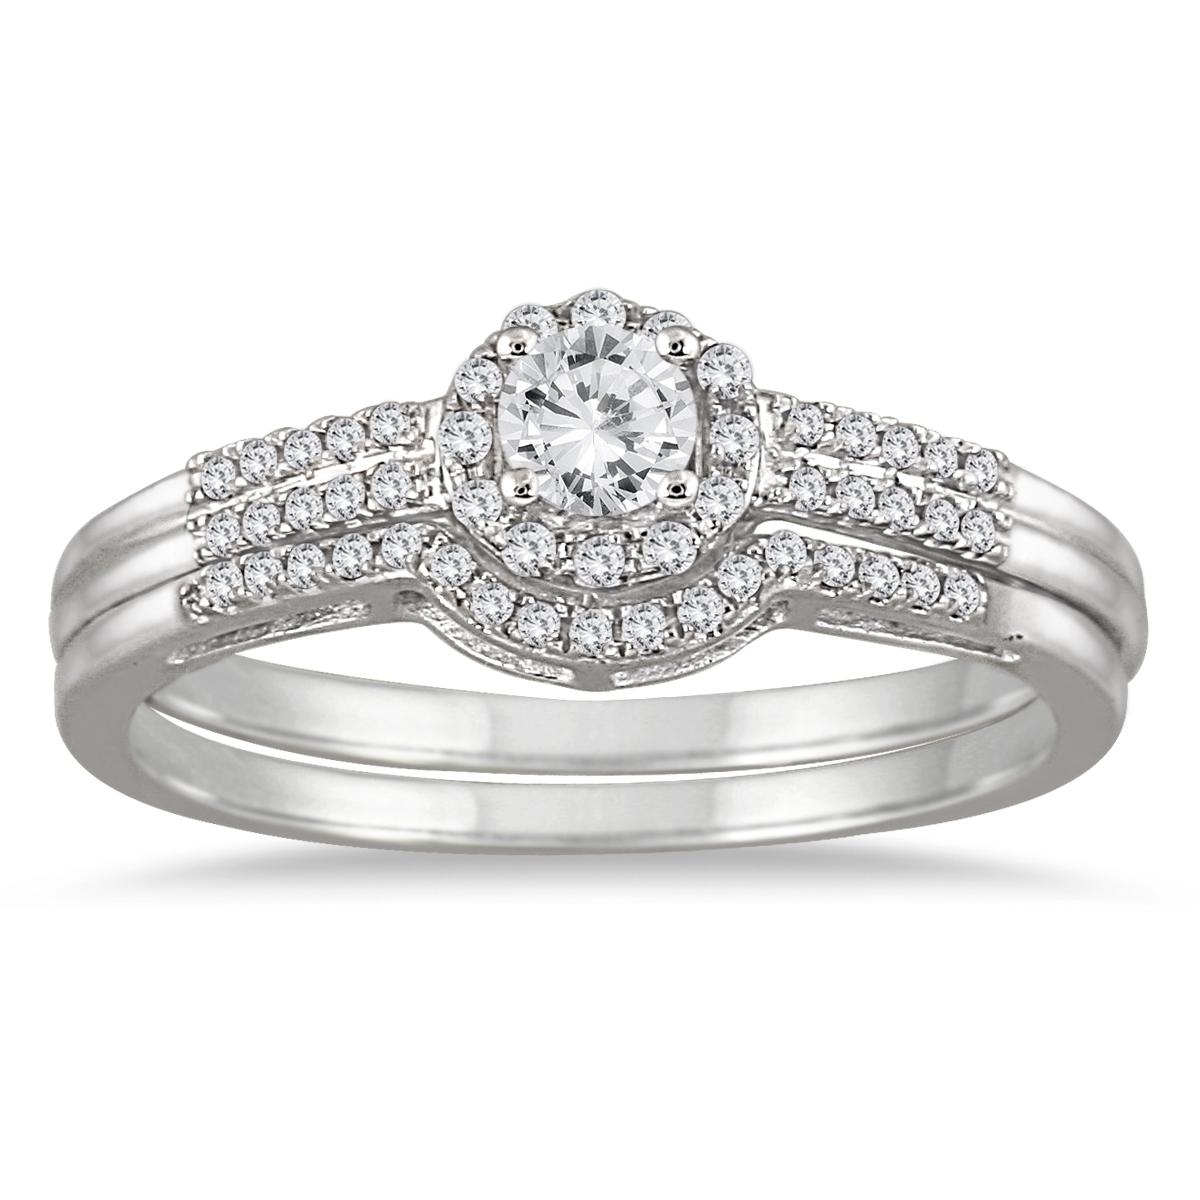 1/2 Carat TW Diamond Halo Bridal Set in 10K White Gold